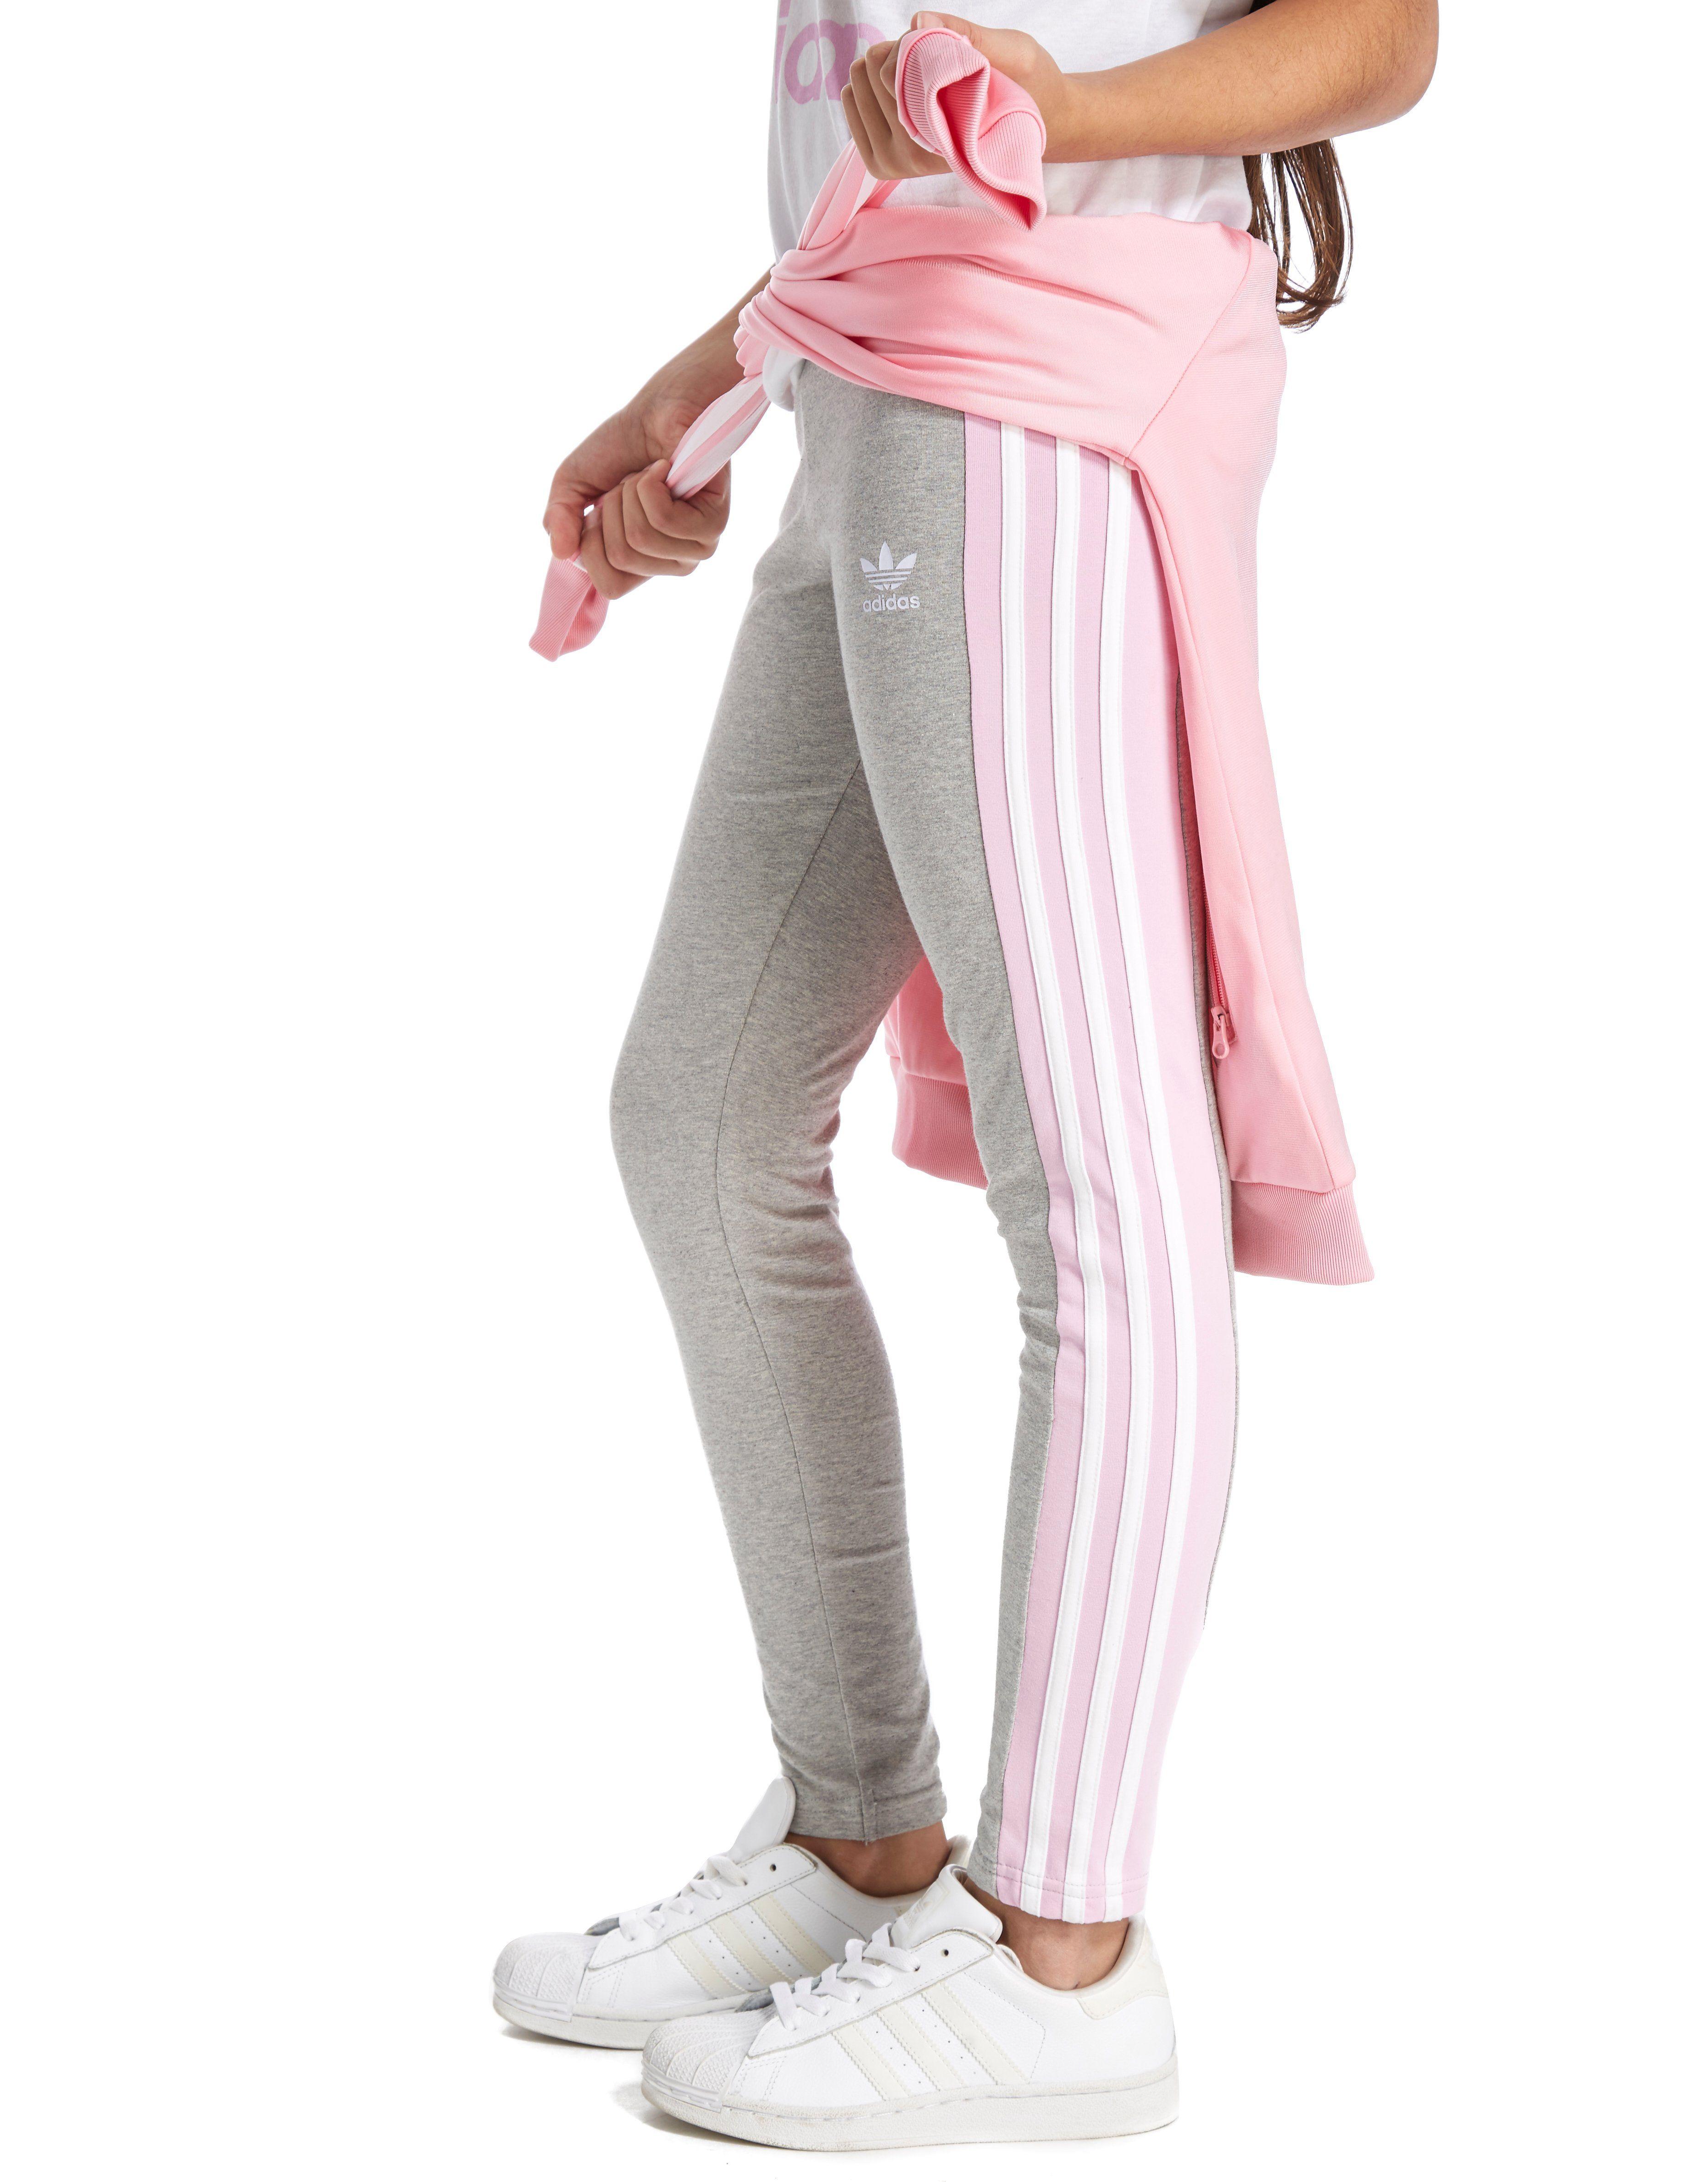 544784df75430 adidas Originals Girls' 3-Stripes Leggings Junior | JD Sports